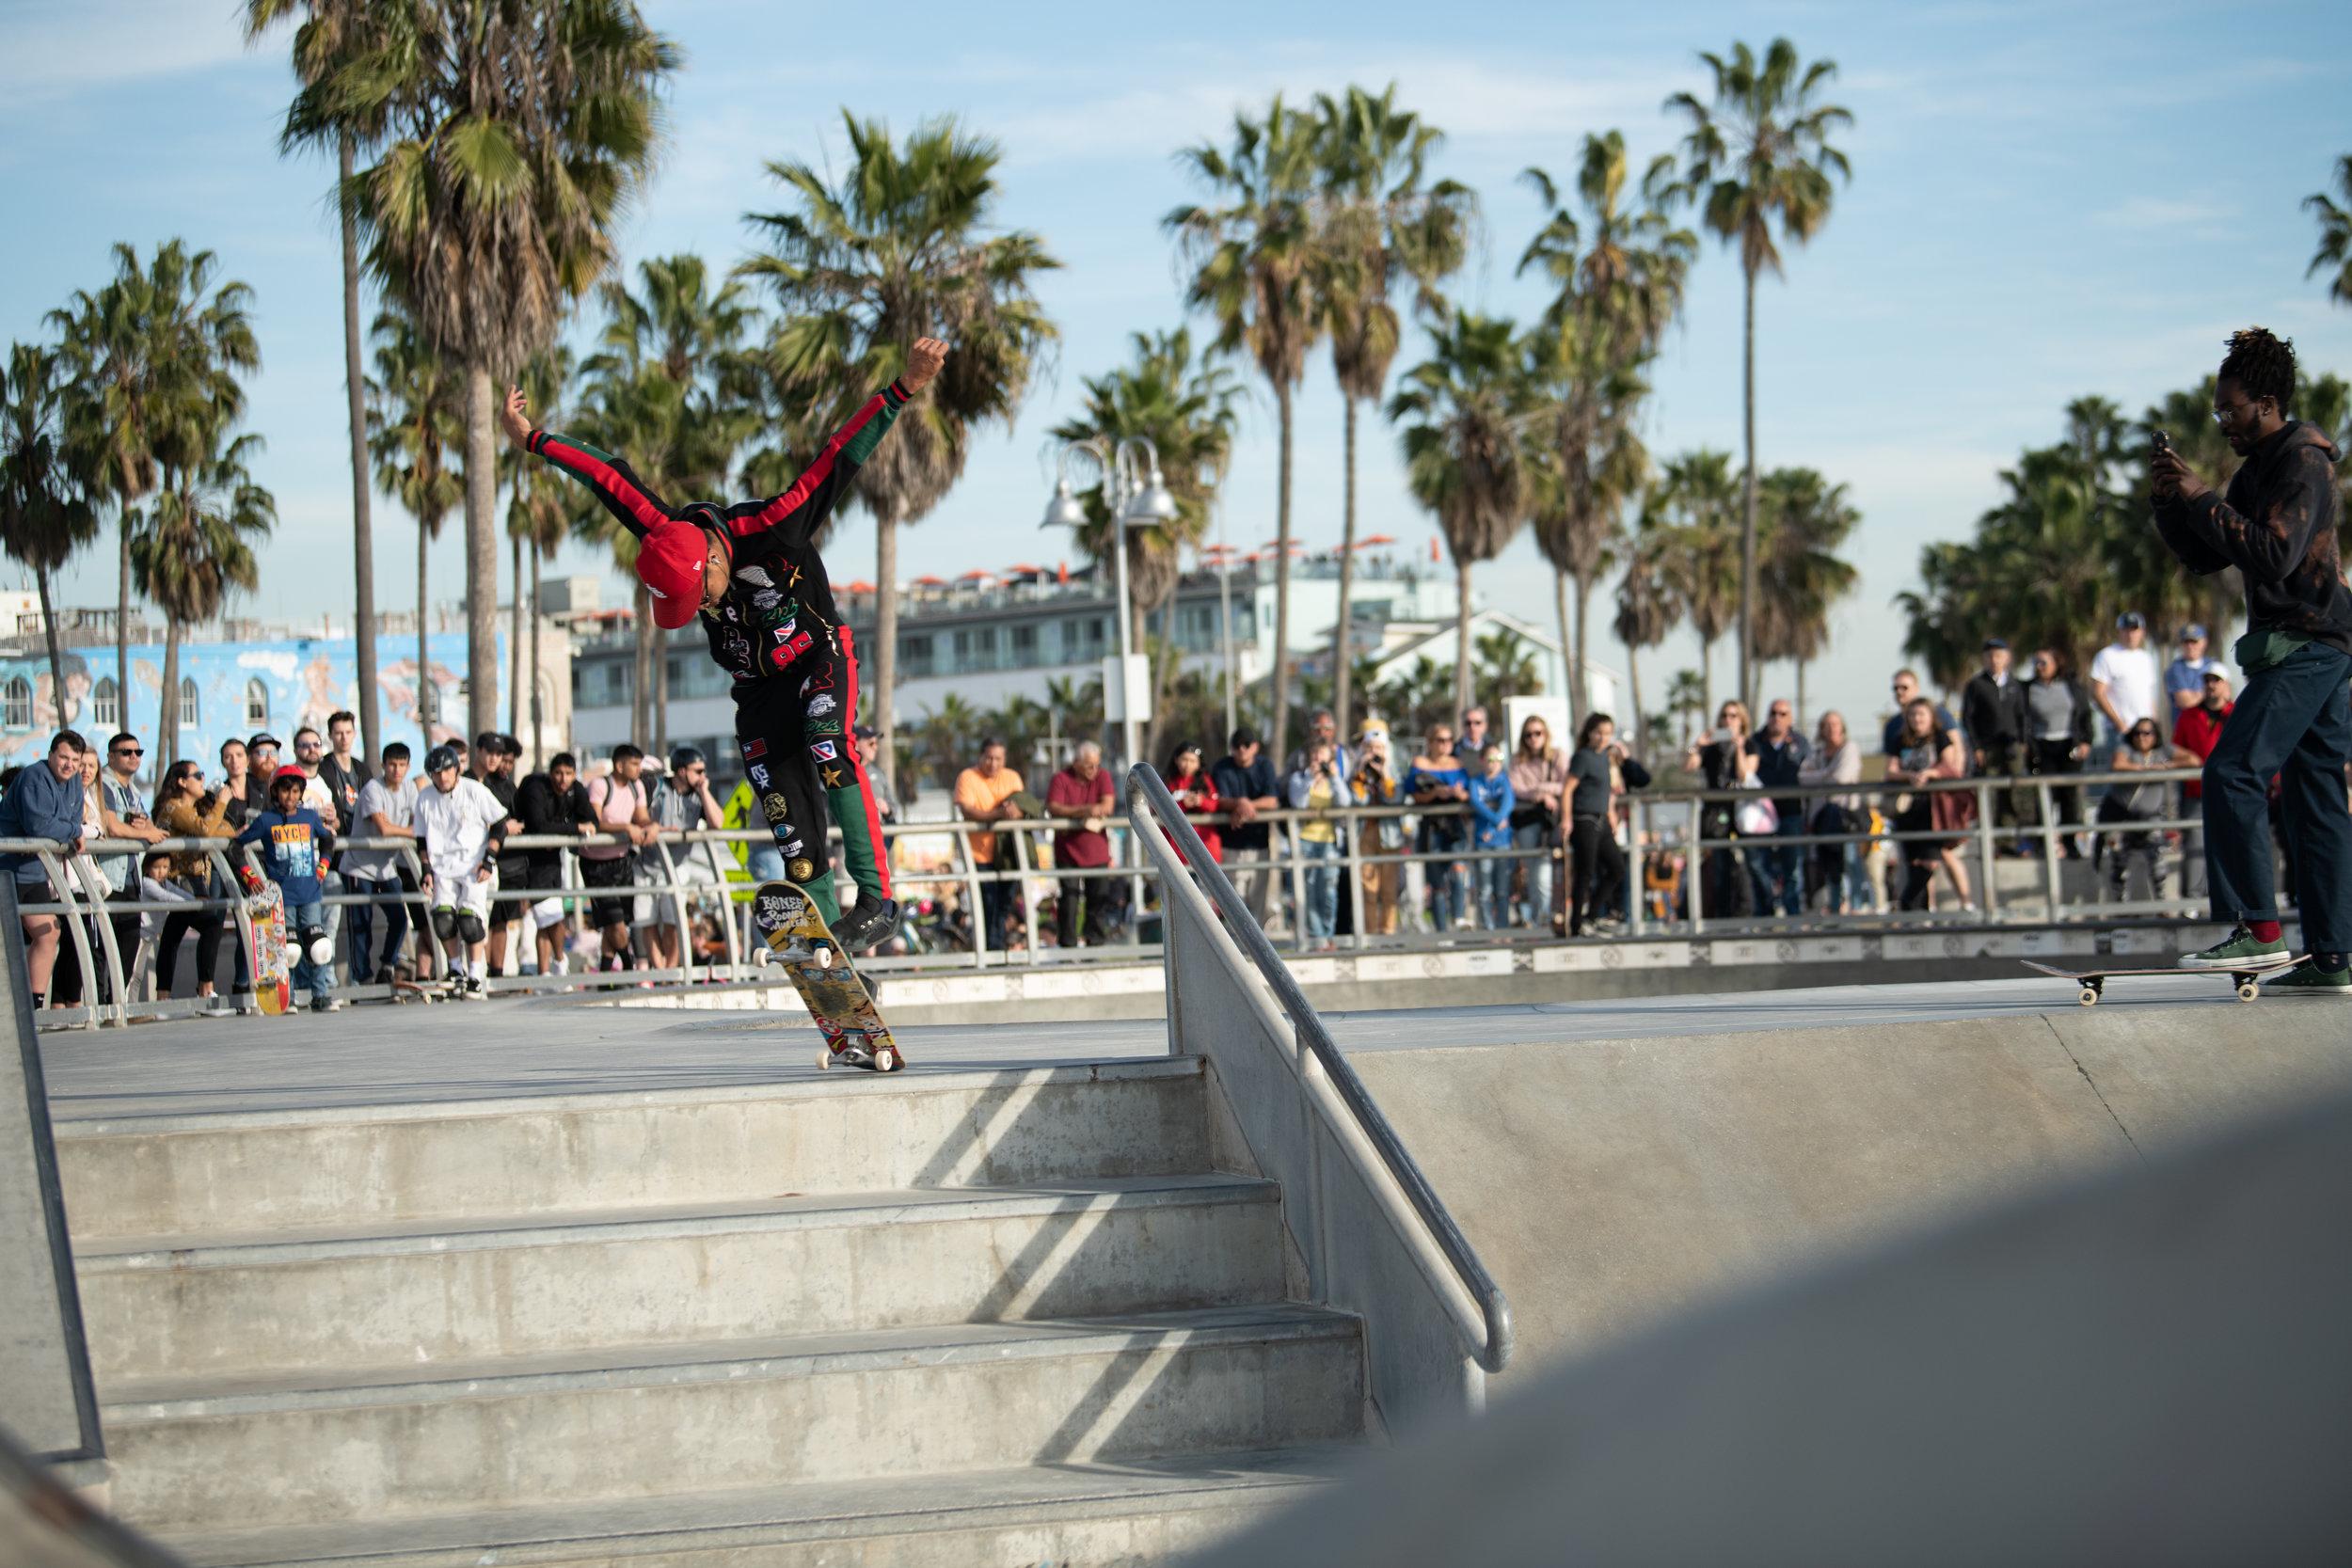 Venice Beach Skateboarders-19.jpg